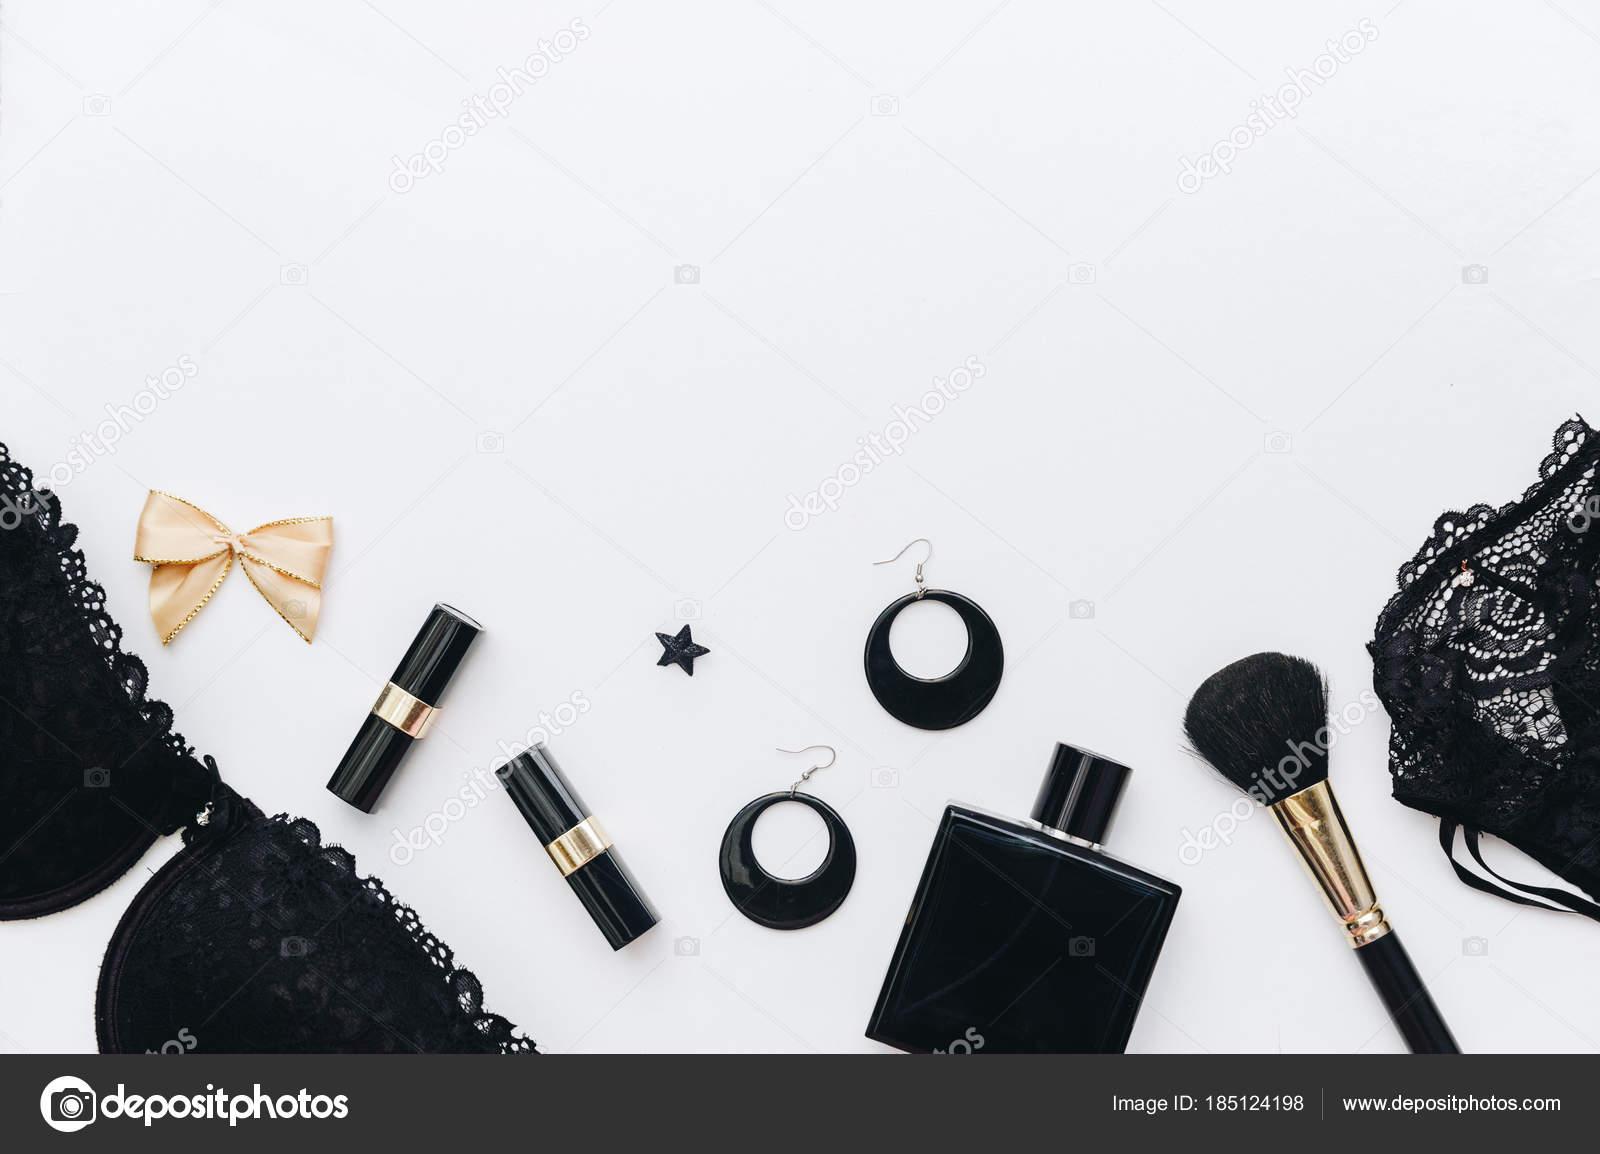 Groß Billige Blogger Vorlagen Bilder - Entry Level Resume Vorlagen ...